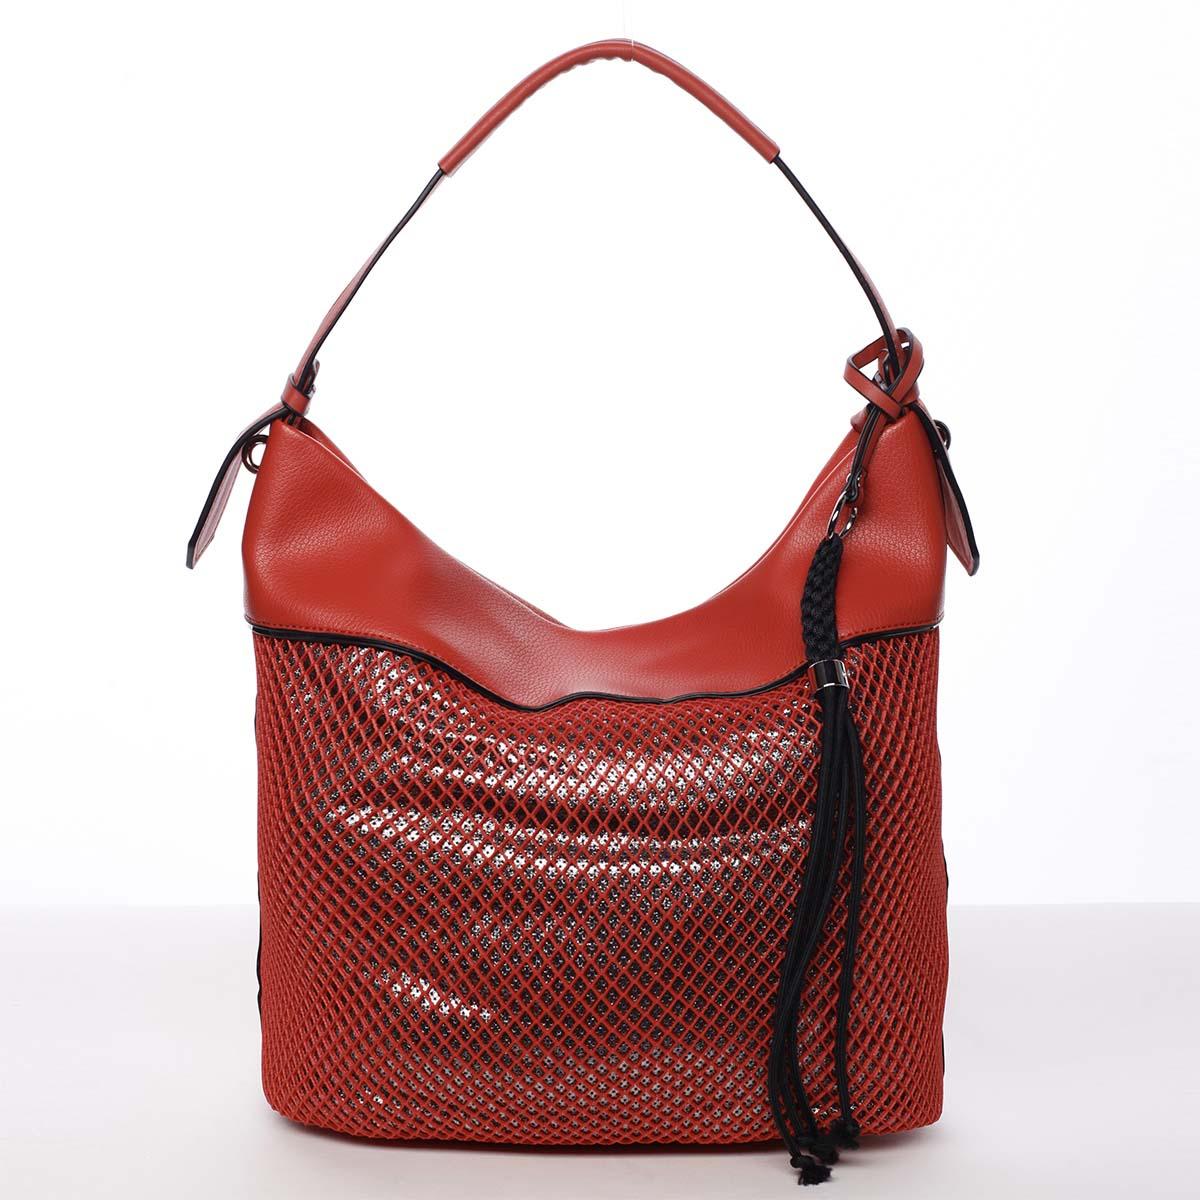 Veľká perforovaná dámska kabelka cez plece červená - Maria C Saghari